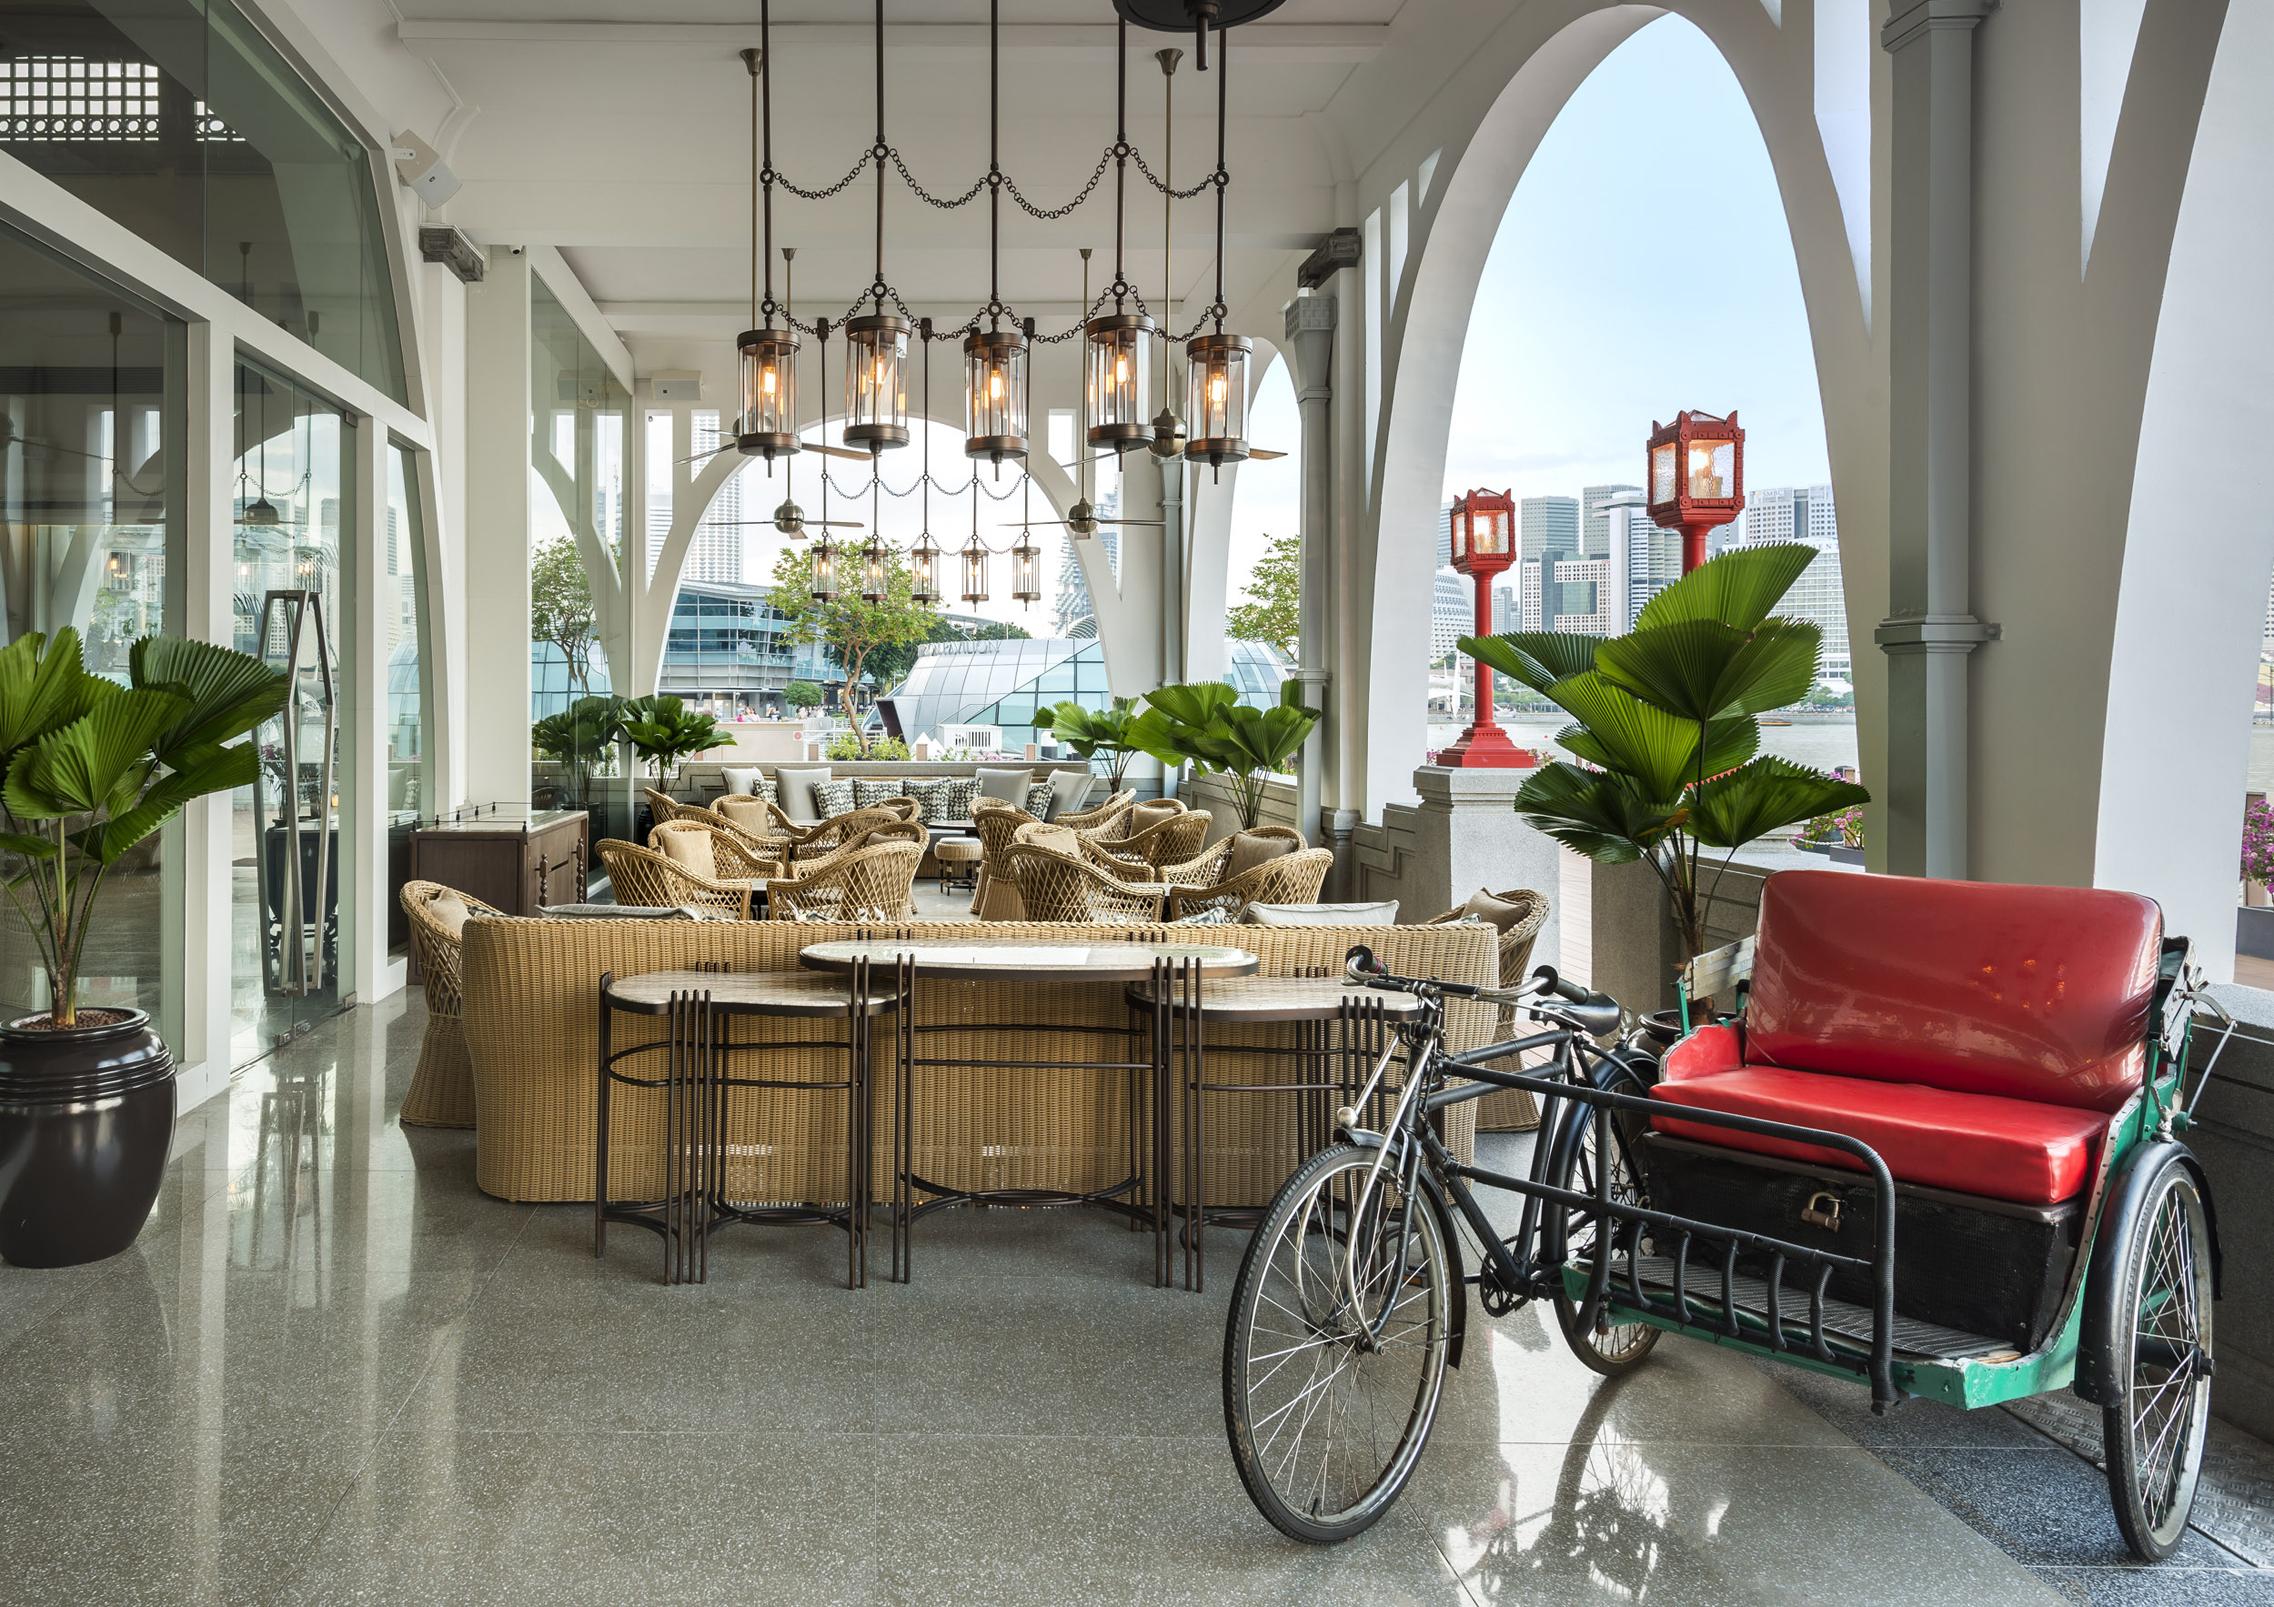 Image courtesy of Fullerton Bay Hotel